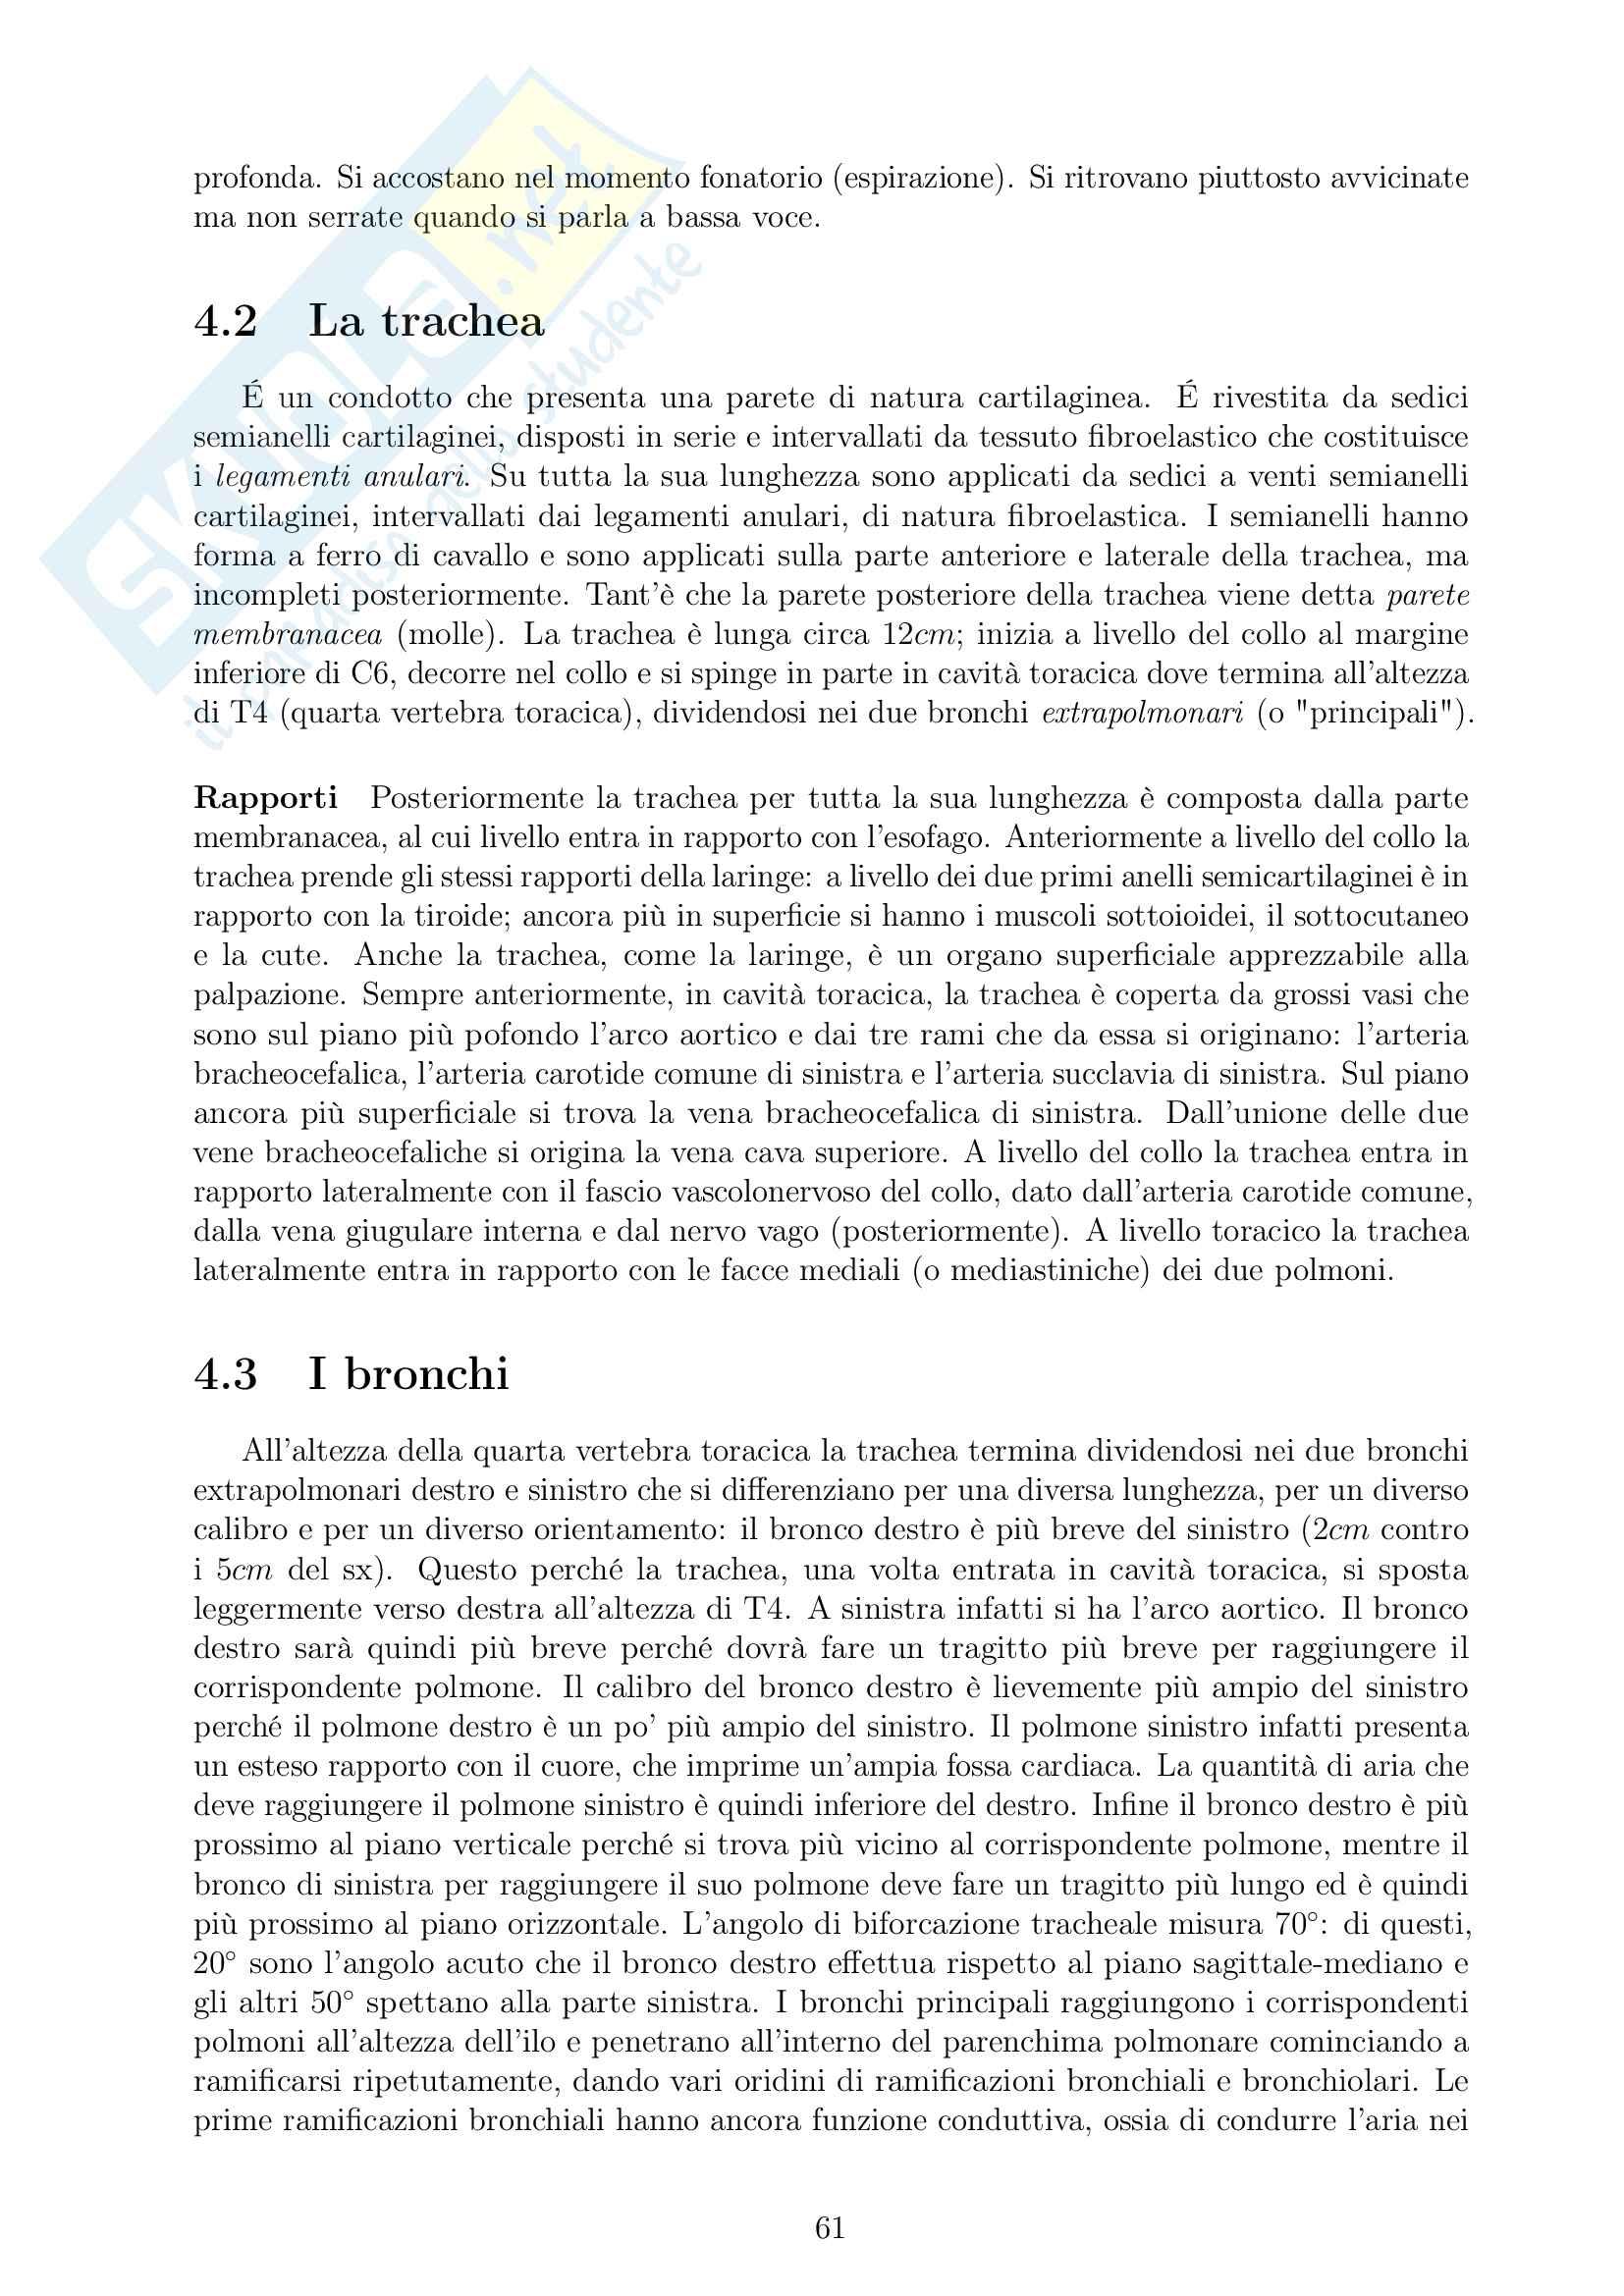 Appunti Anatomia Umana Pag. 61